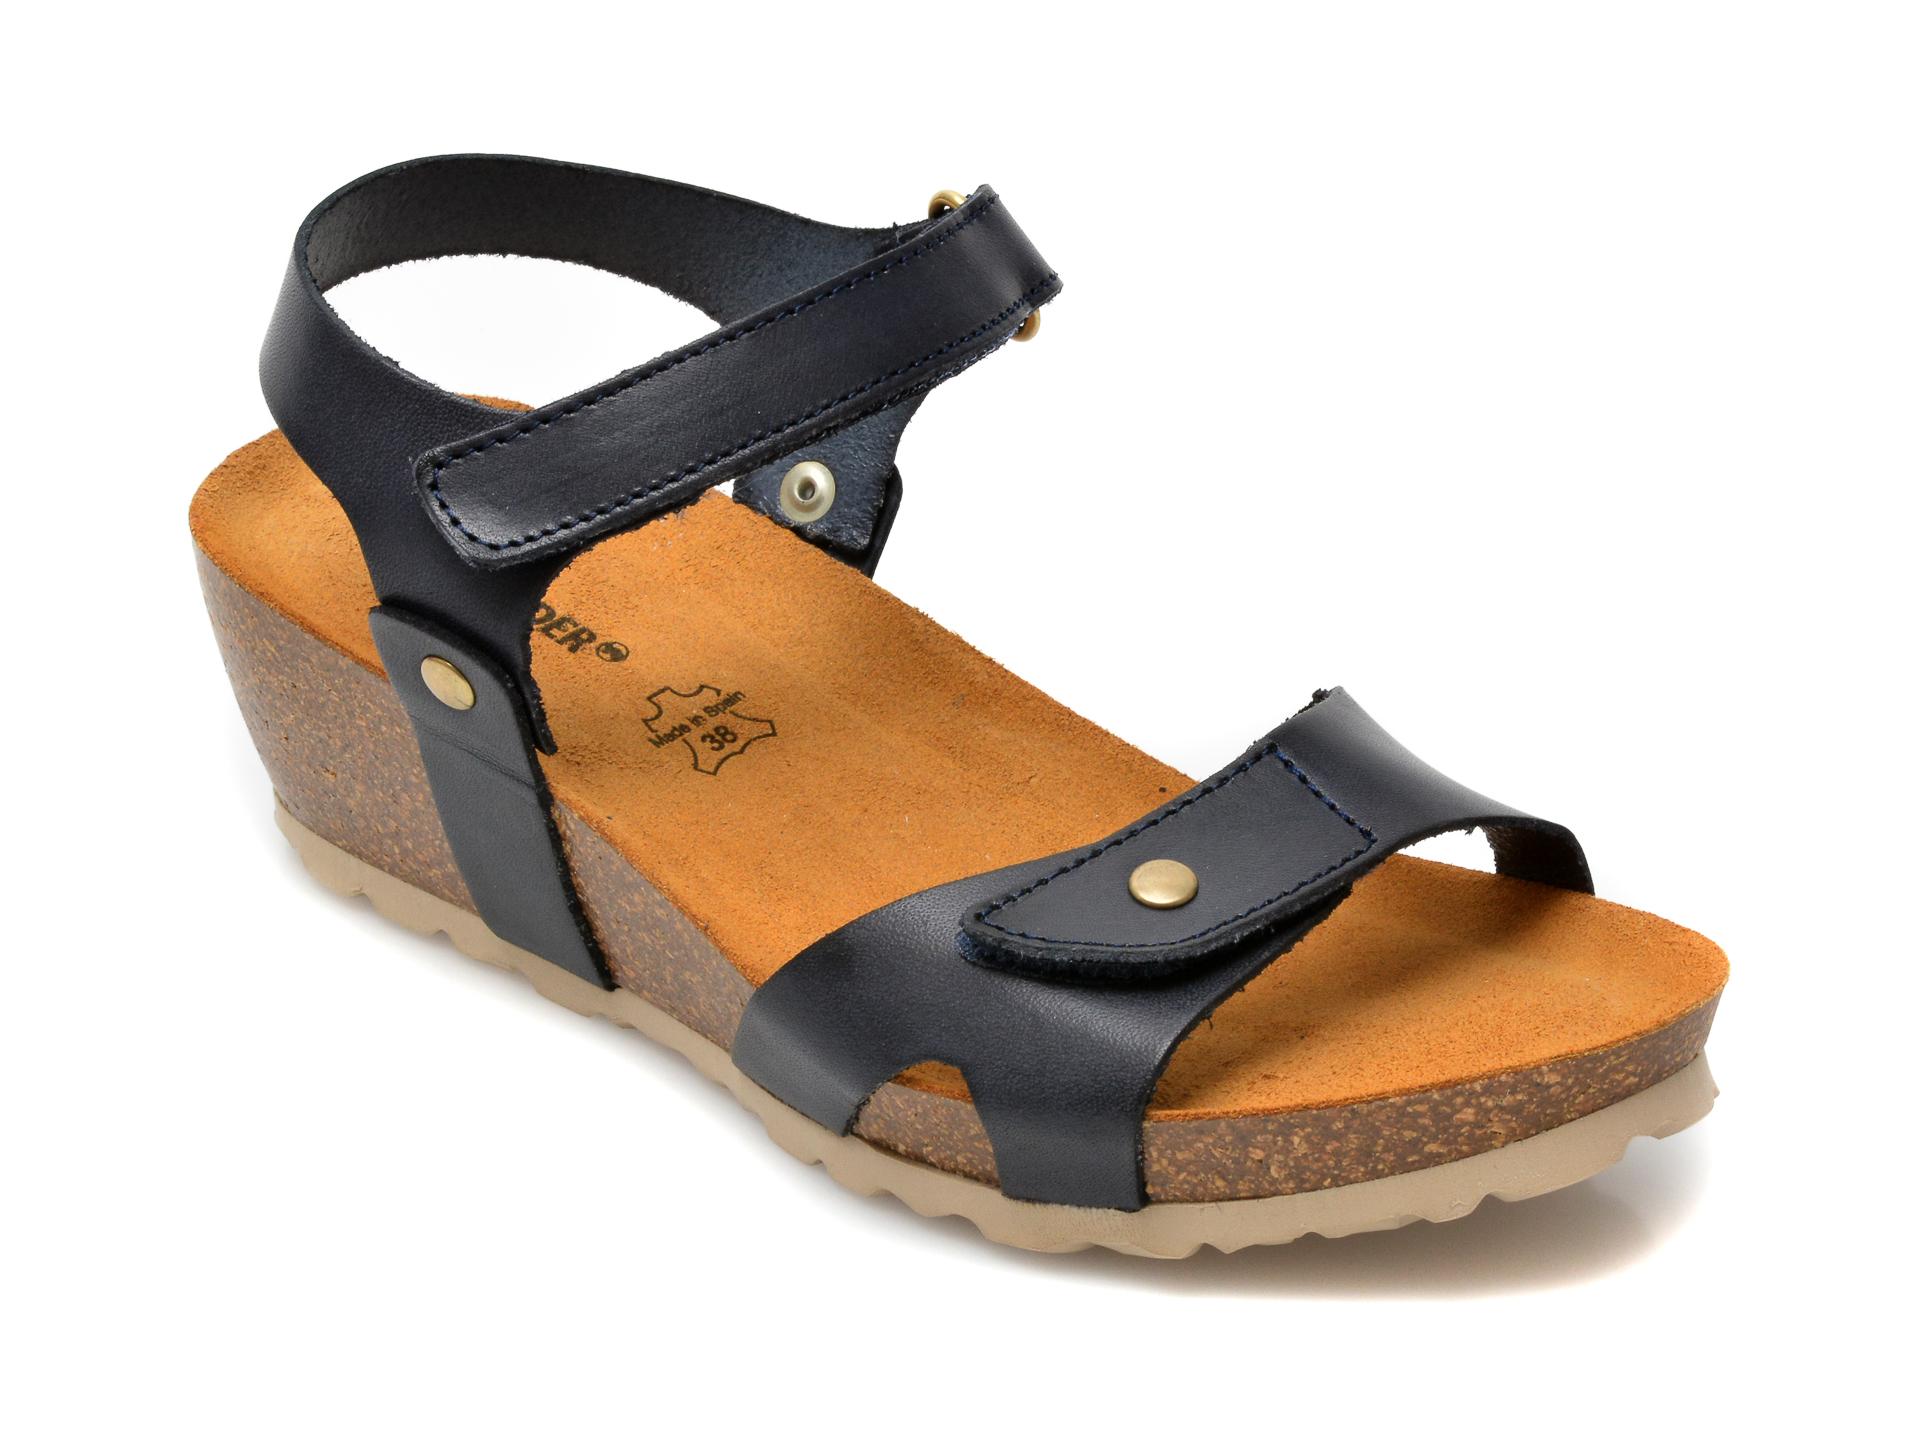 Sandale SALAMANDER bleumarin, 23501, din piele naturala imagine otter.ro 2021